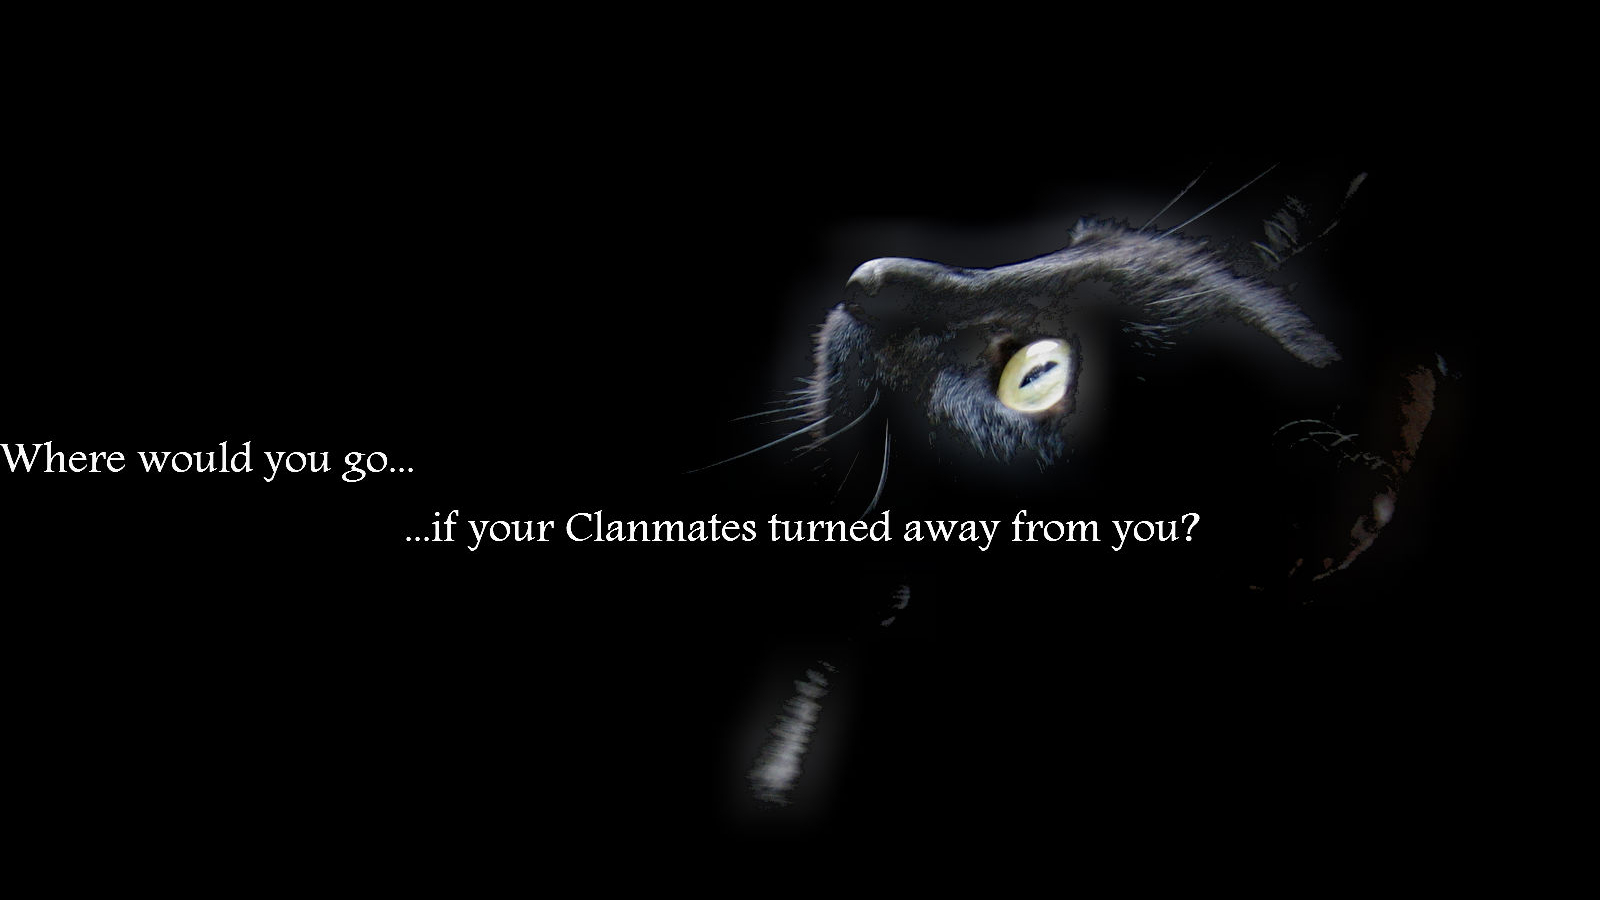 Free download Image Black Cat EarthClan wallpaperjpg Warrior